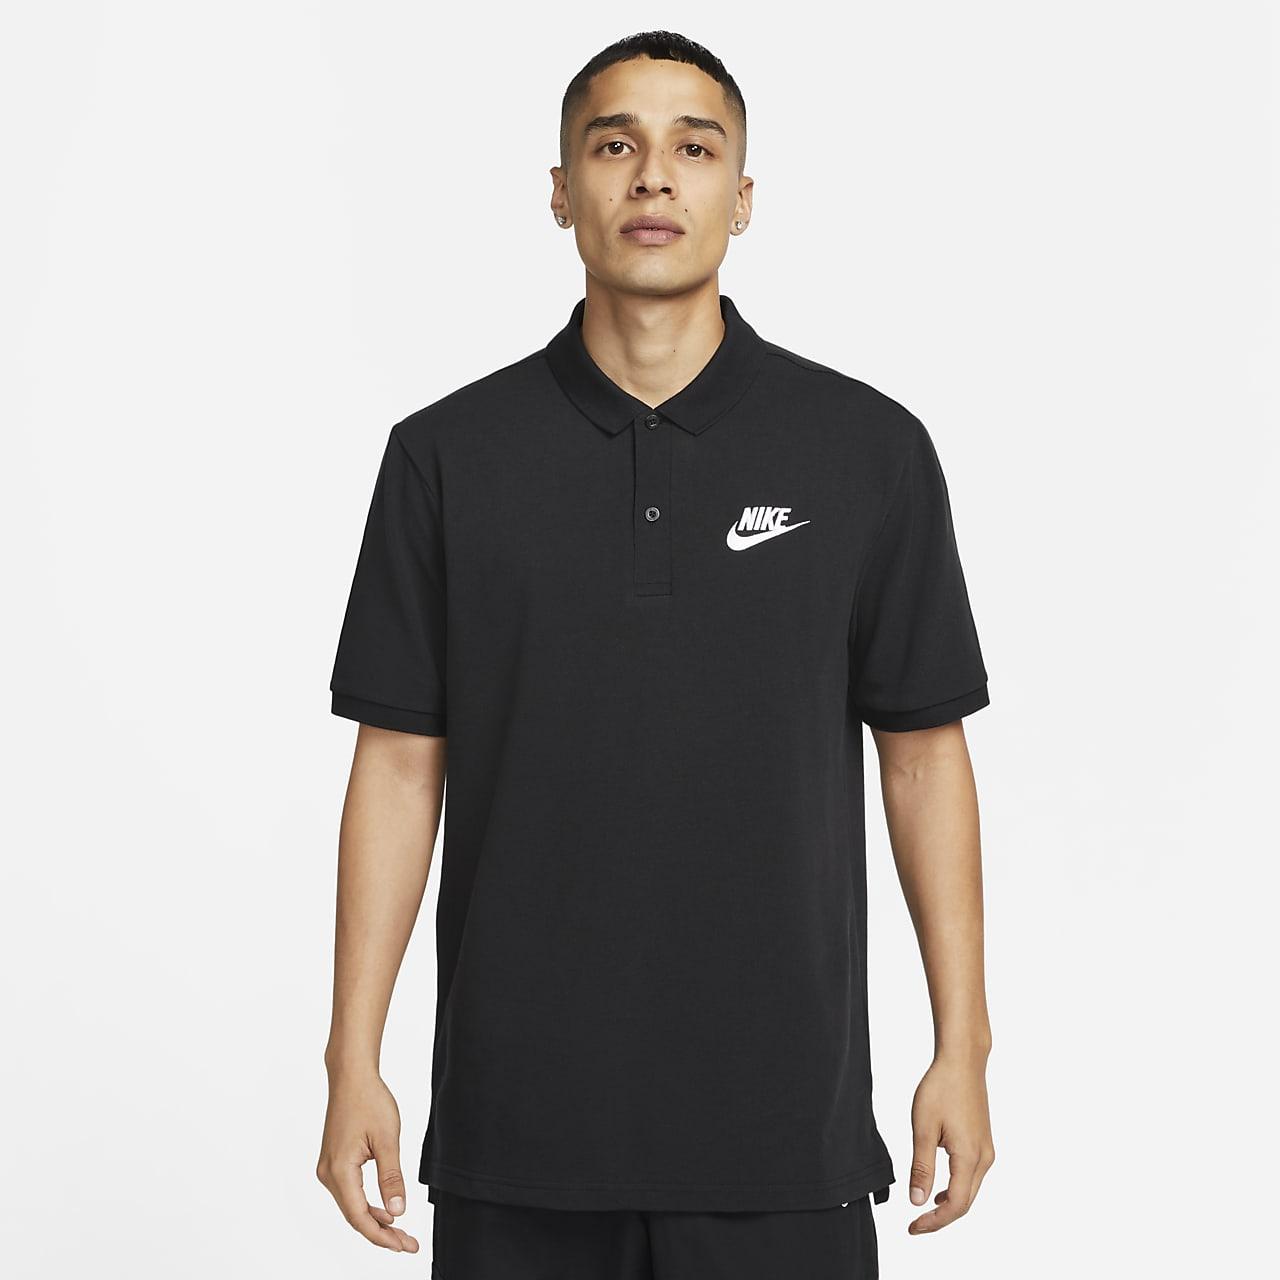 d8ae602fb8889 Polo Nike Sportswear pour Homme. Nike.com BE